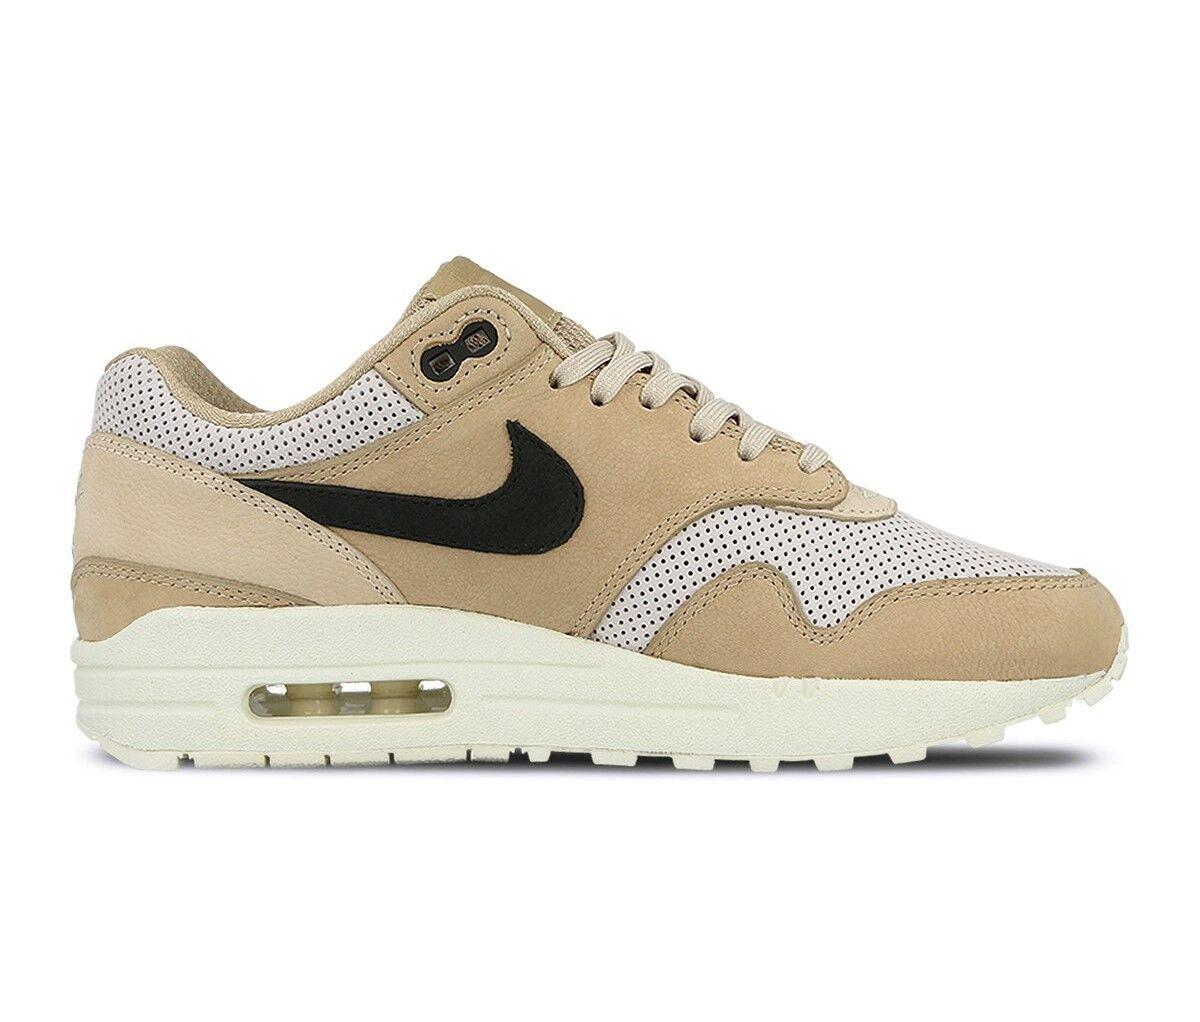 45e9dfdfbf5 Nike Wmns Air 1 Pinnacle 839608-201 2.5 UK Max Size nqefdn6563 ...